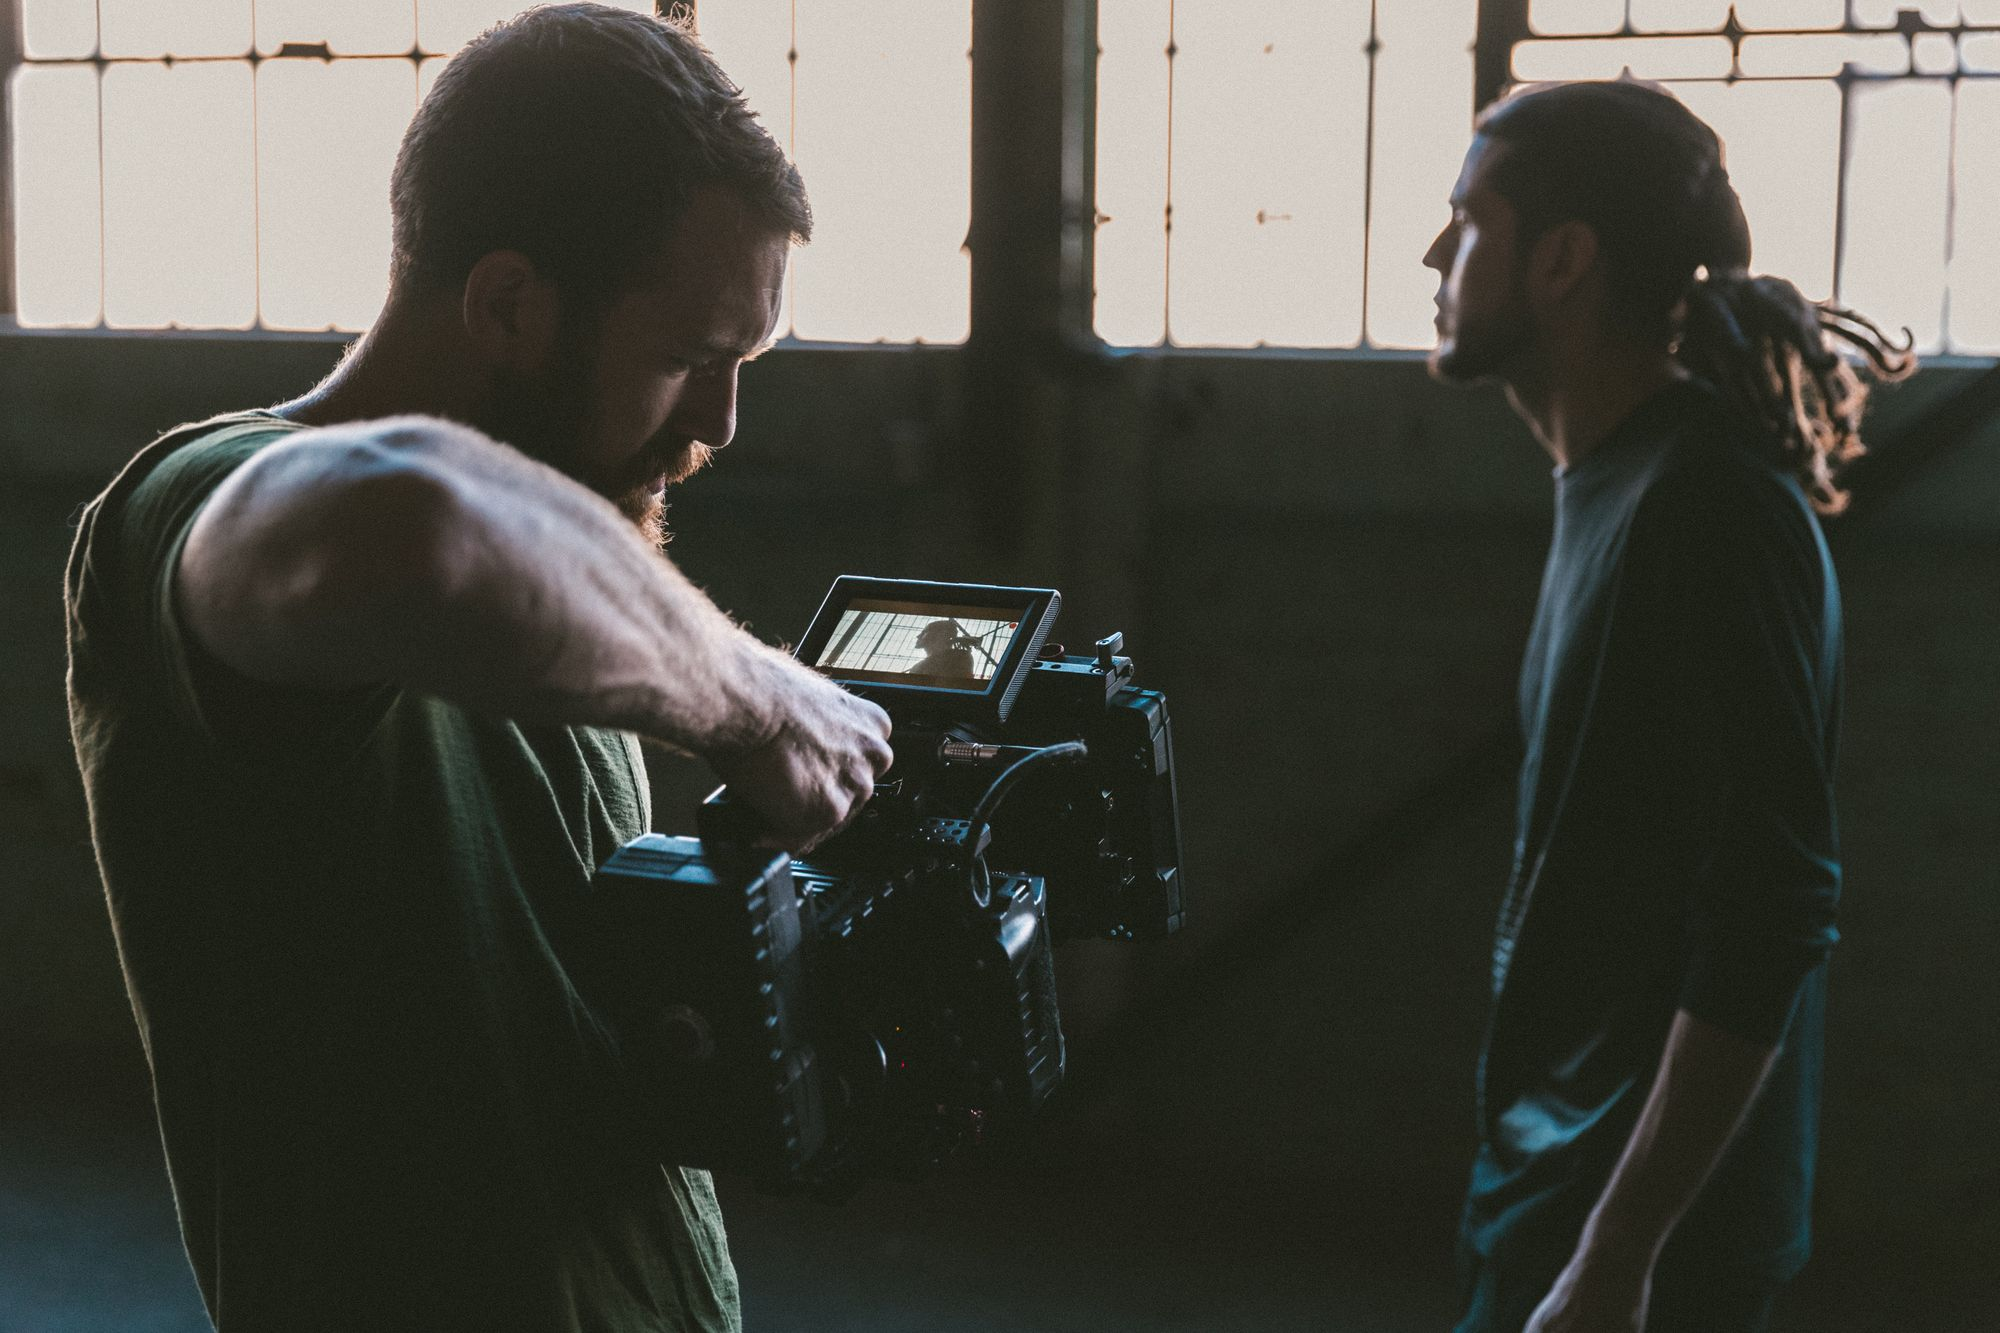 camera-man-filming-guy-in-building